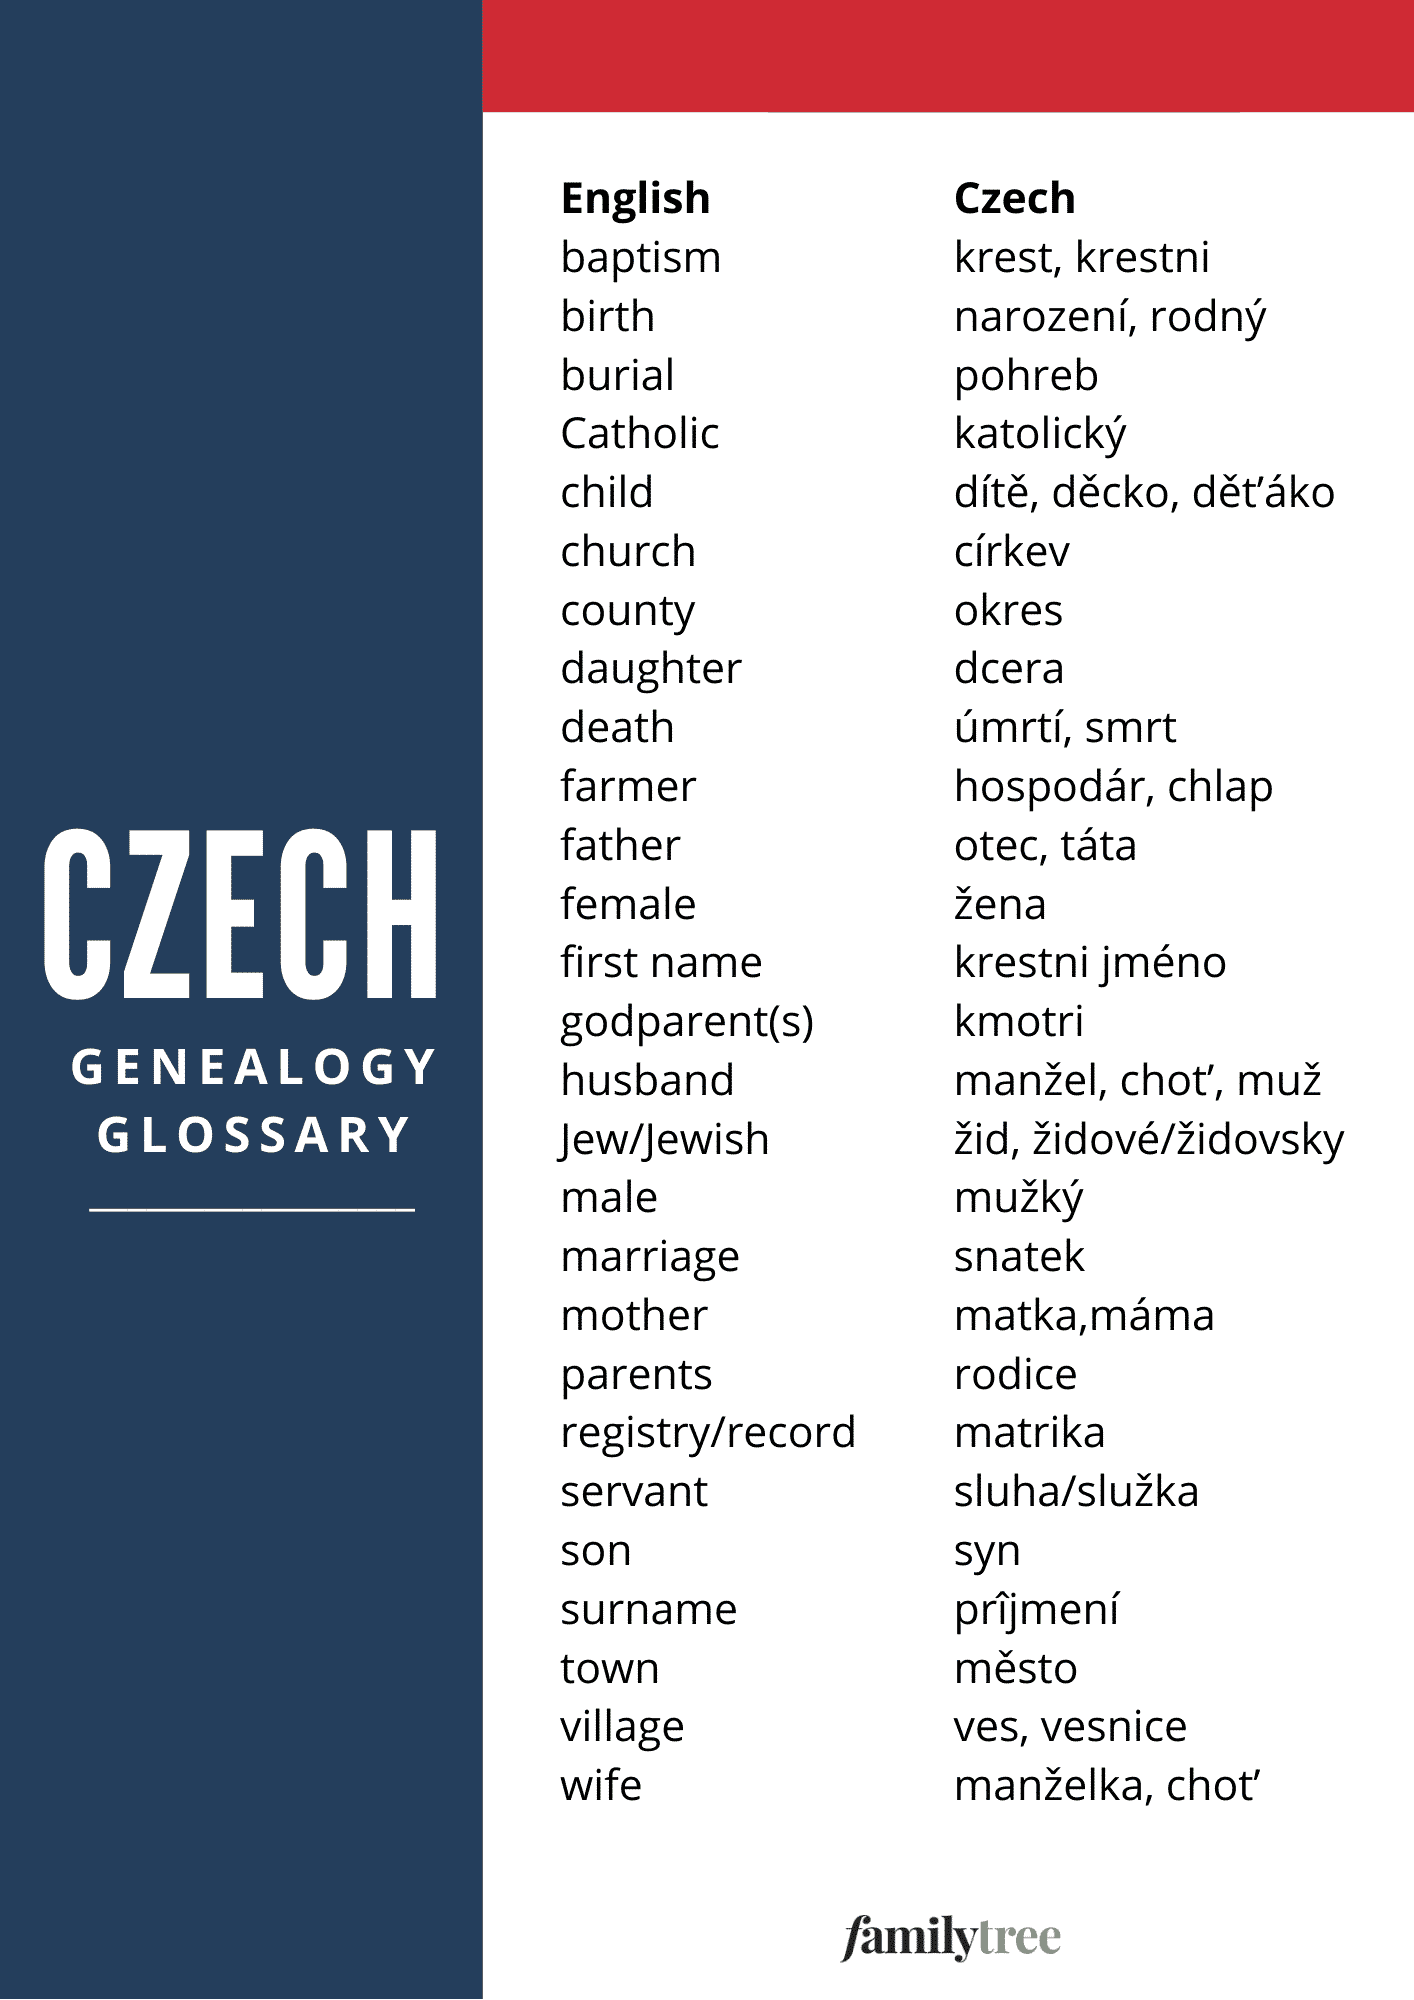 czech genealogy glossary